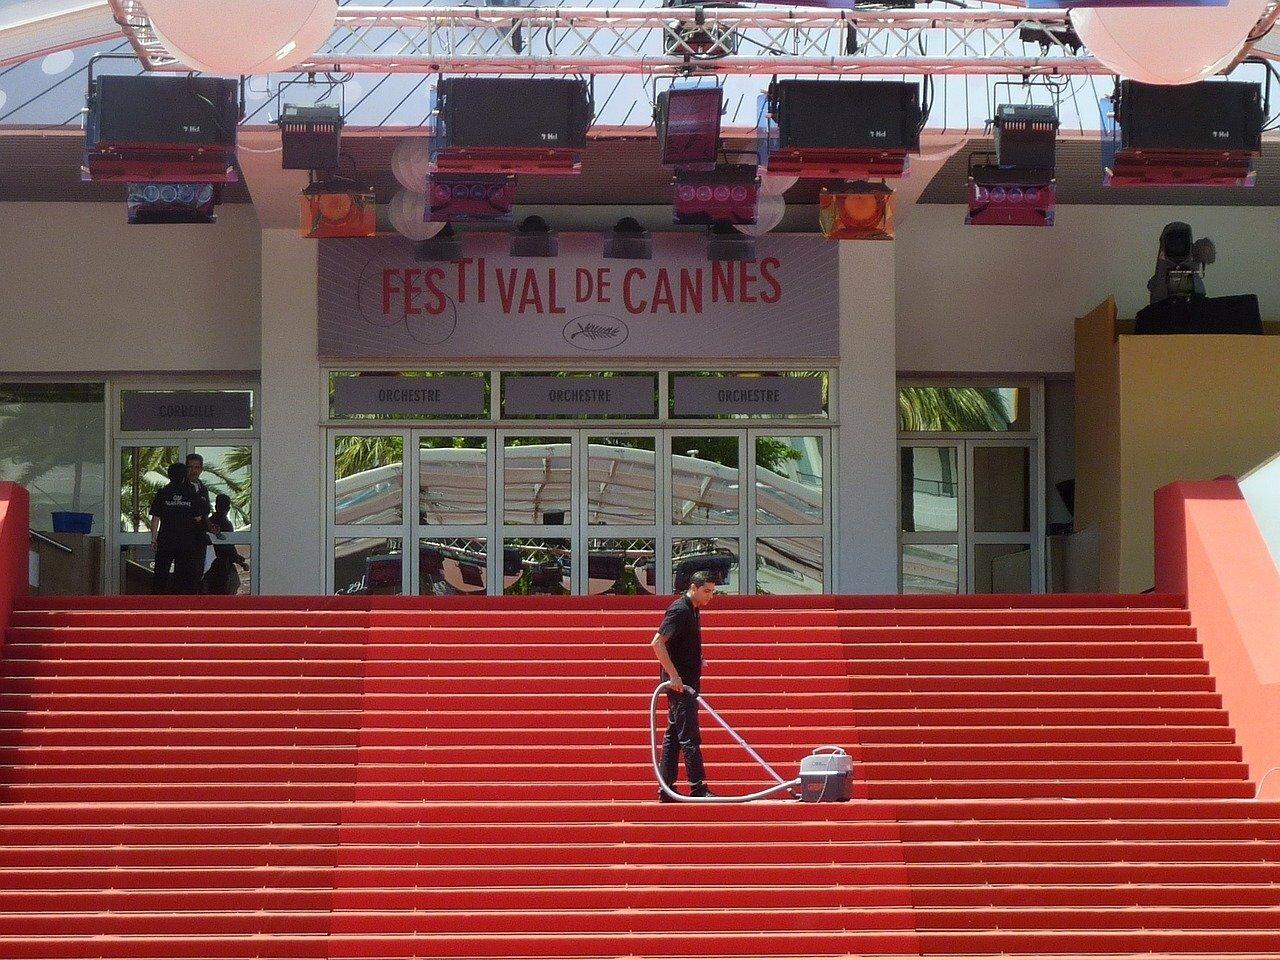 Festival de Cannes ©Hermann Traub de Pixabay